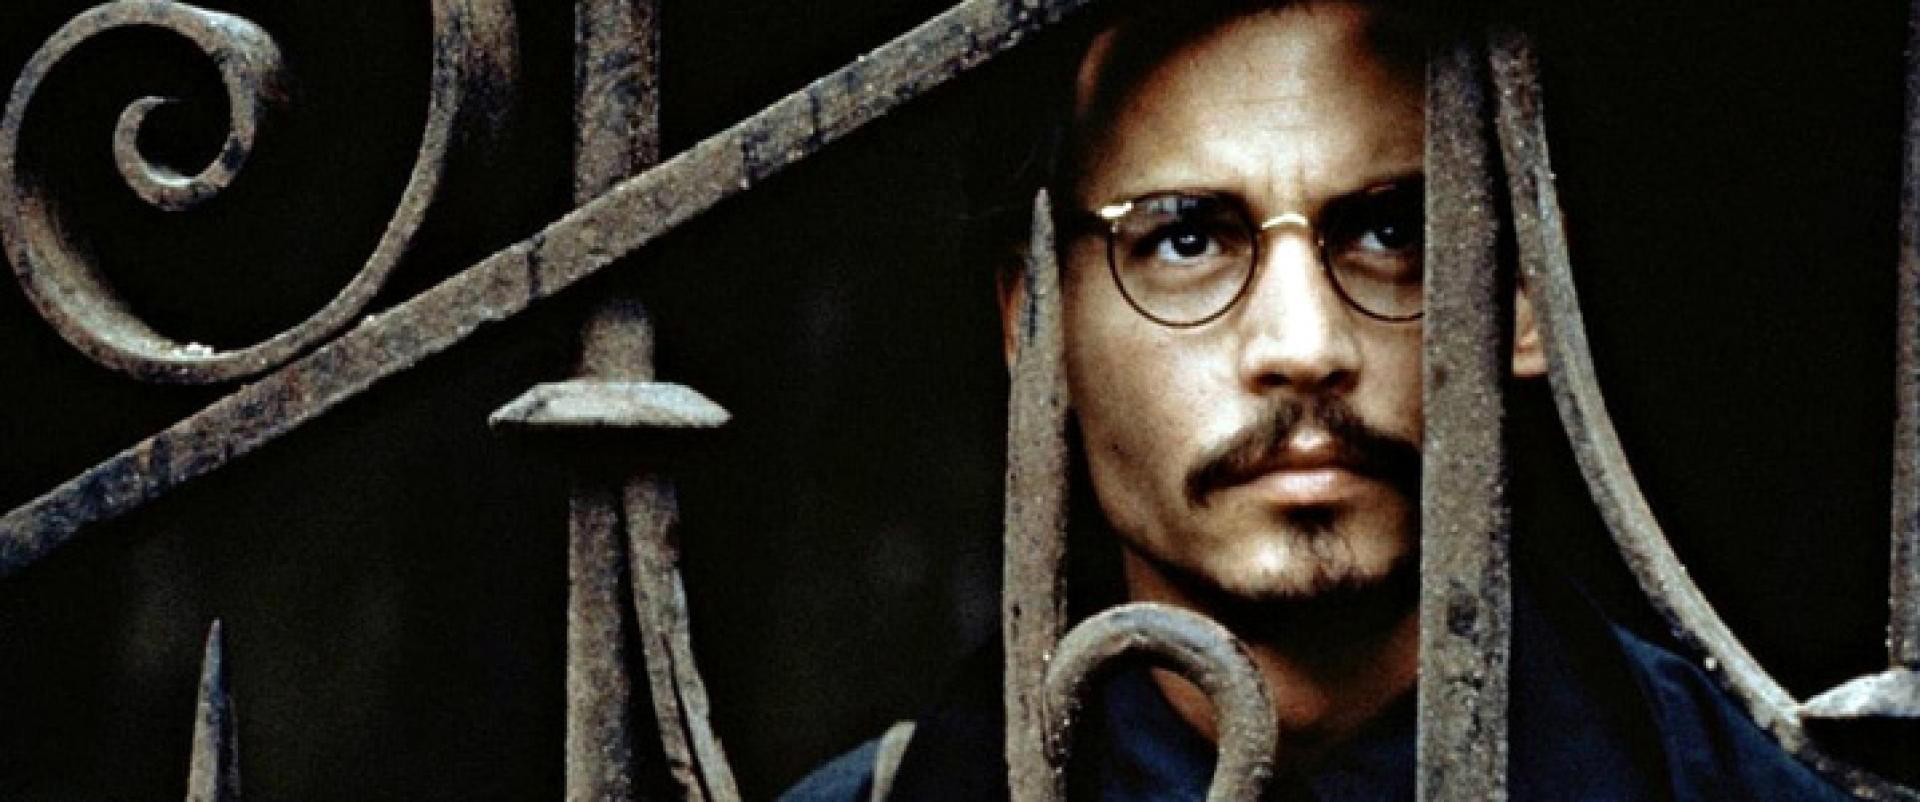 The Ninth Gate - A kilencedik kapu (1999)